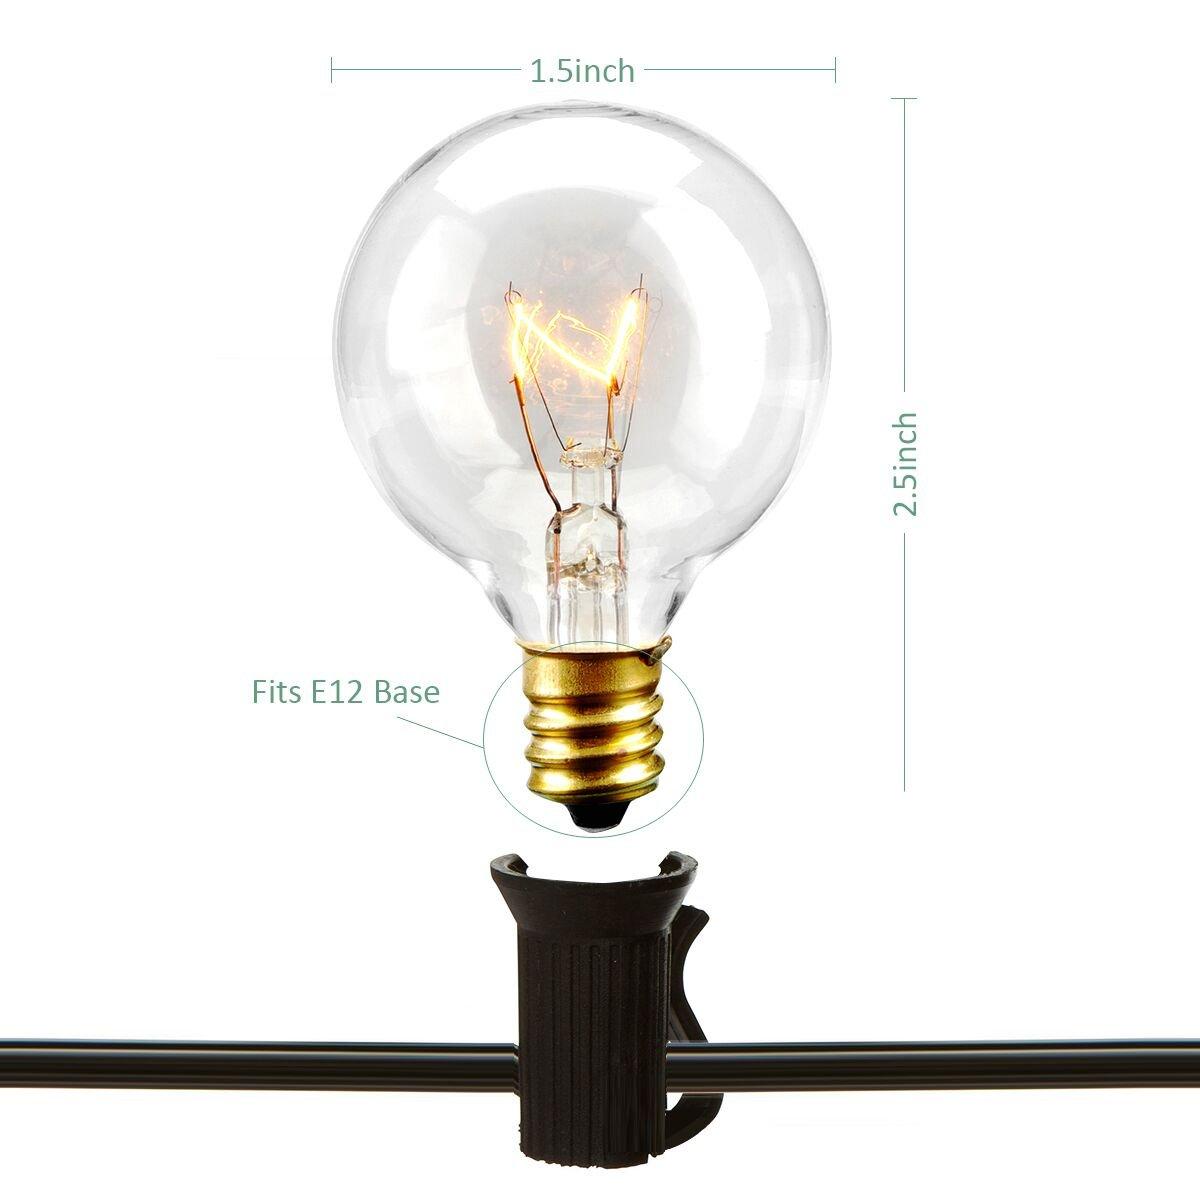 Amazon.com : Patio Lights Party String Lights G40 Globe Bulbs Warm ...